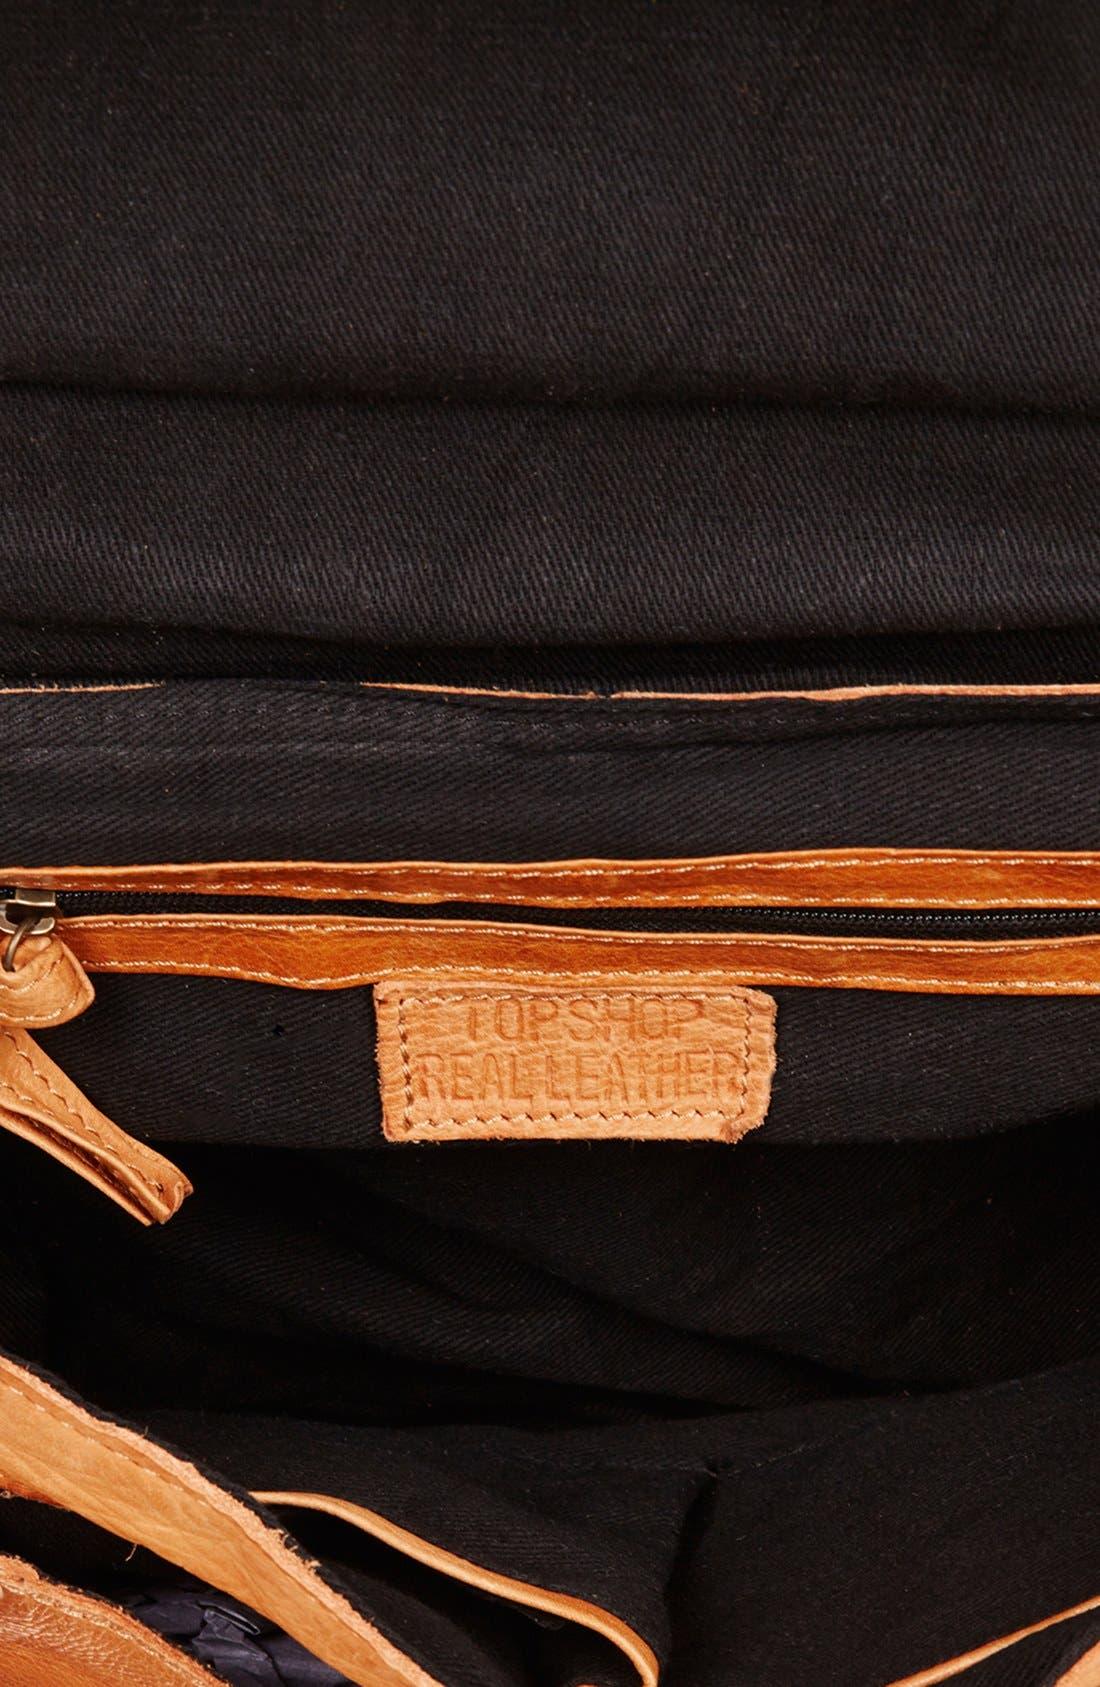 Alternate Image 3  - Topshop 'Brogue' Leather Satchel